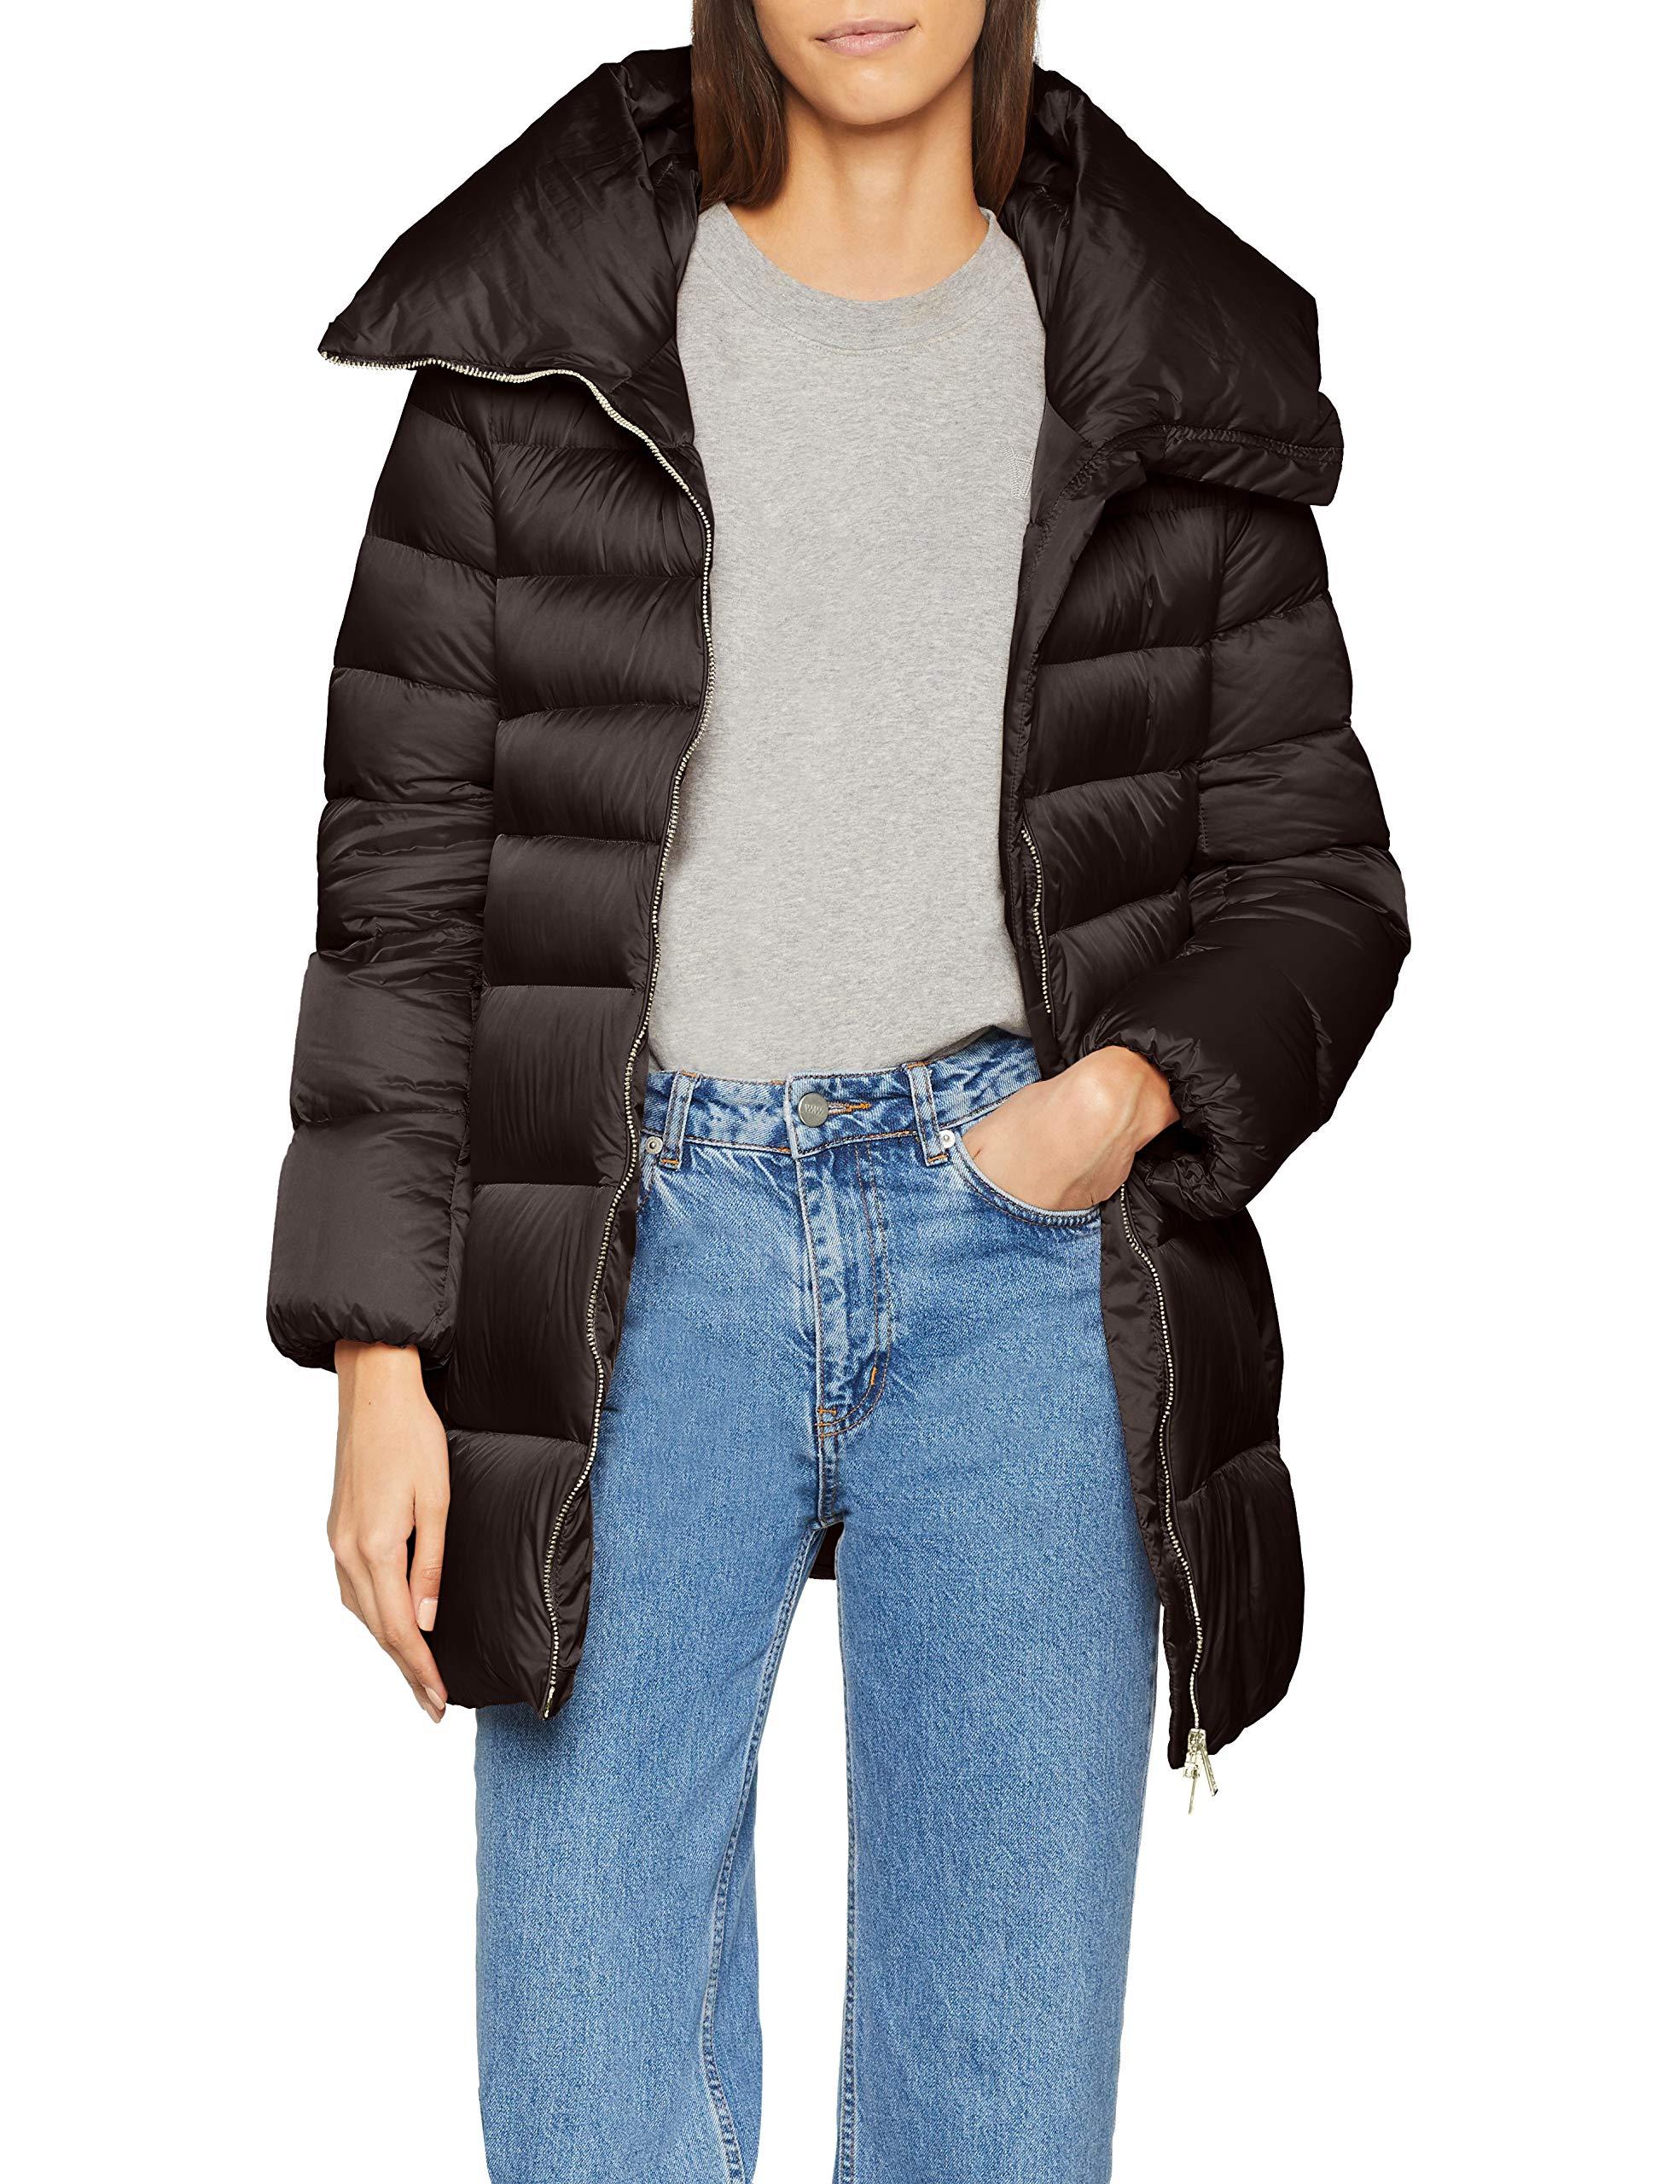 Short Femme Coat small Add Hooded Down ManteauNoirblack 8506X Y76gybf